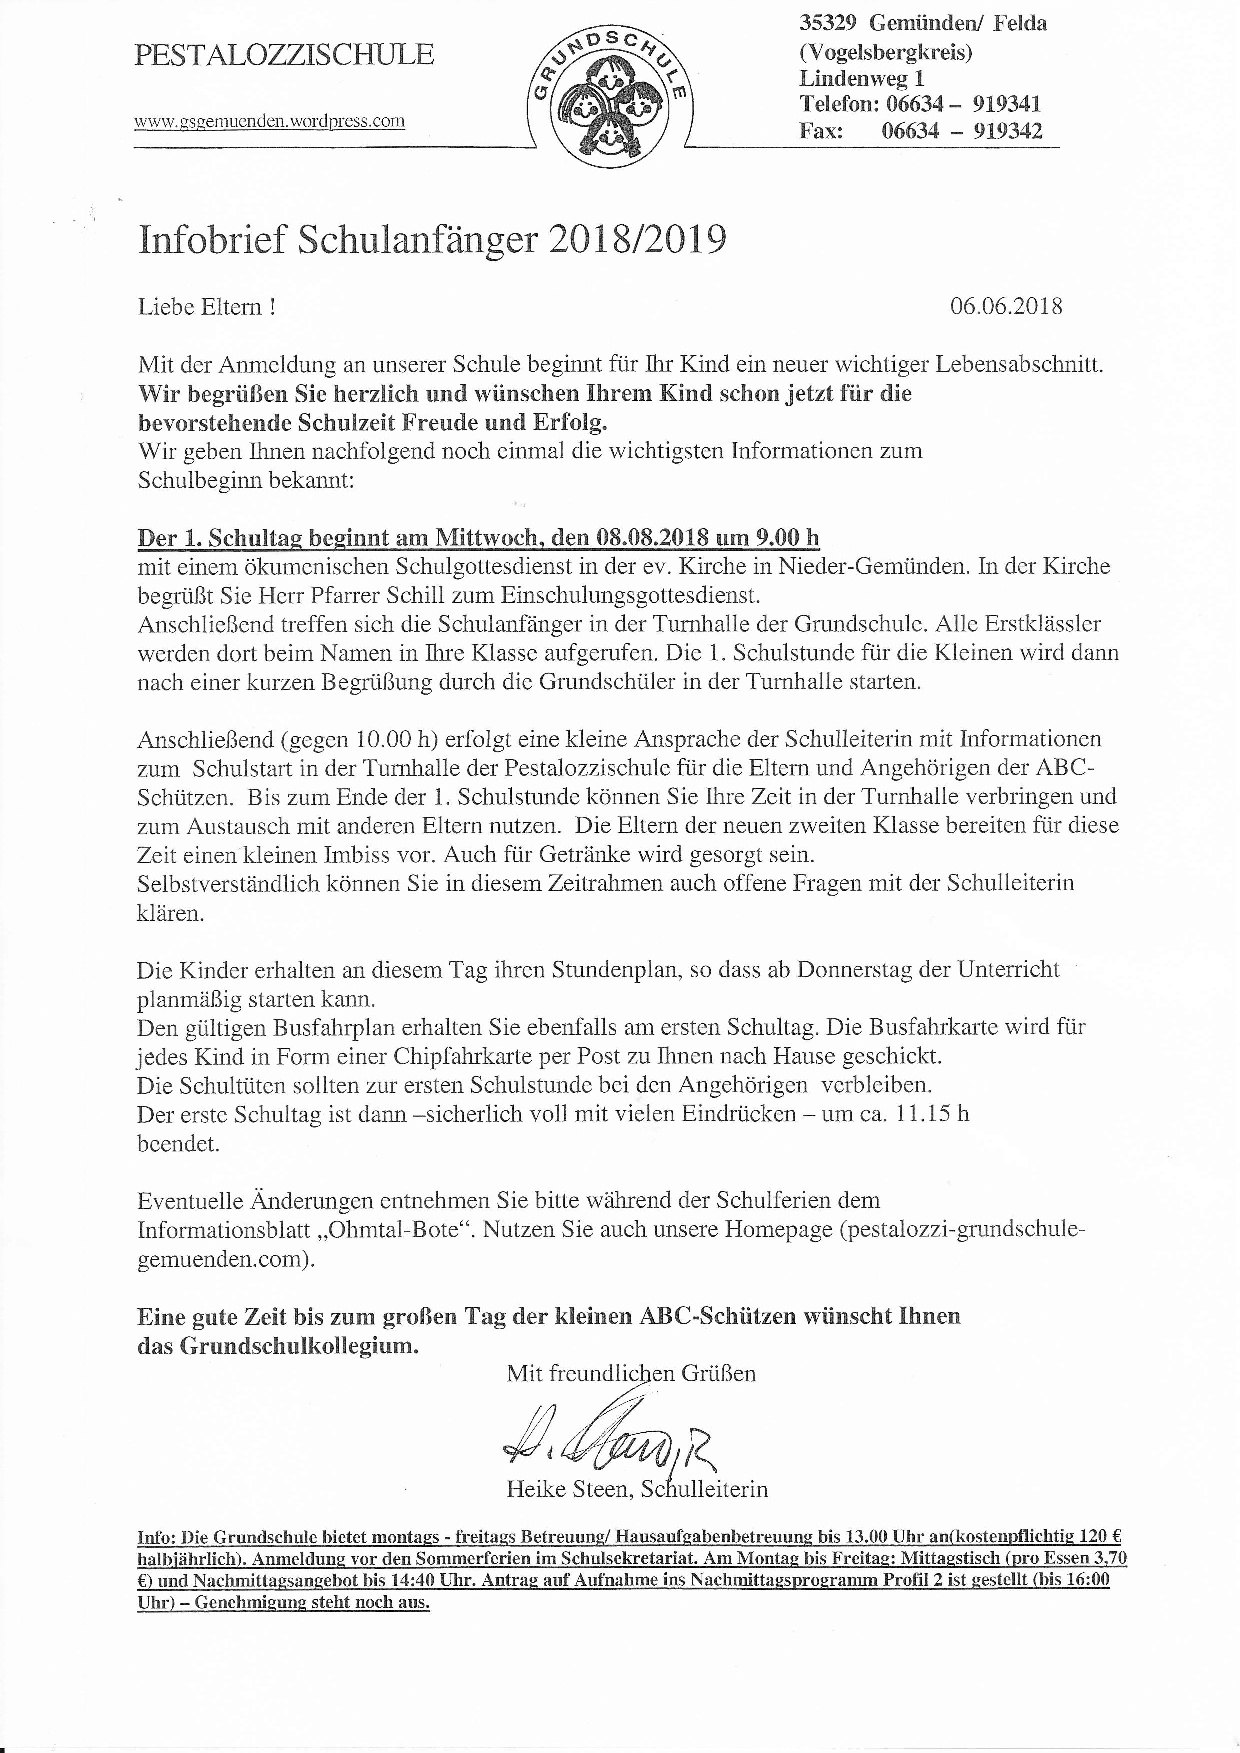 Infobrief Schulanf. 2018